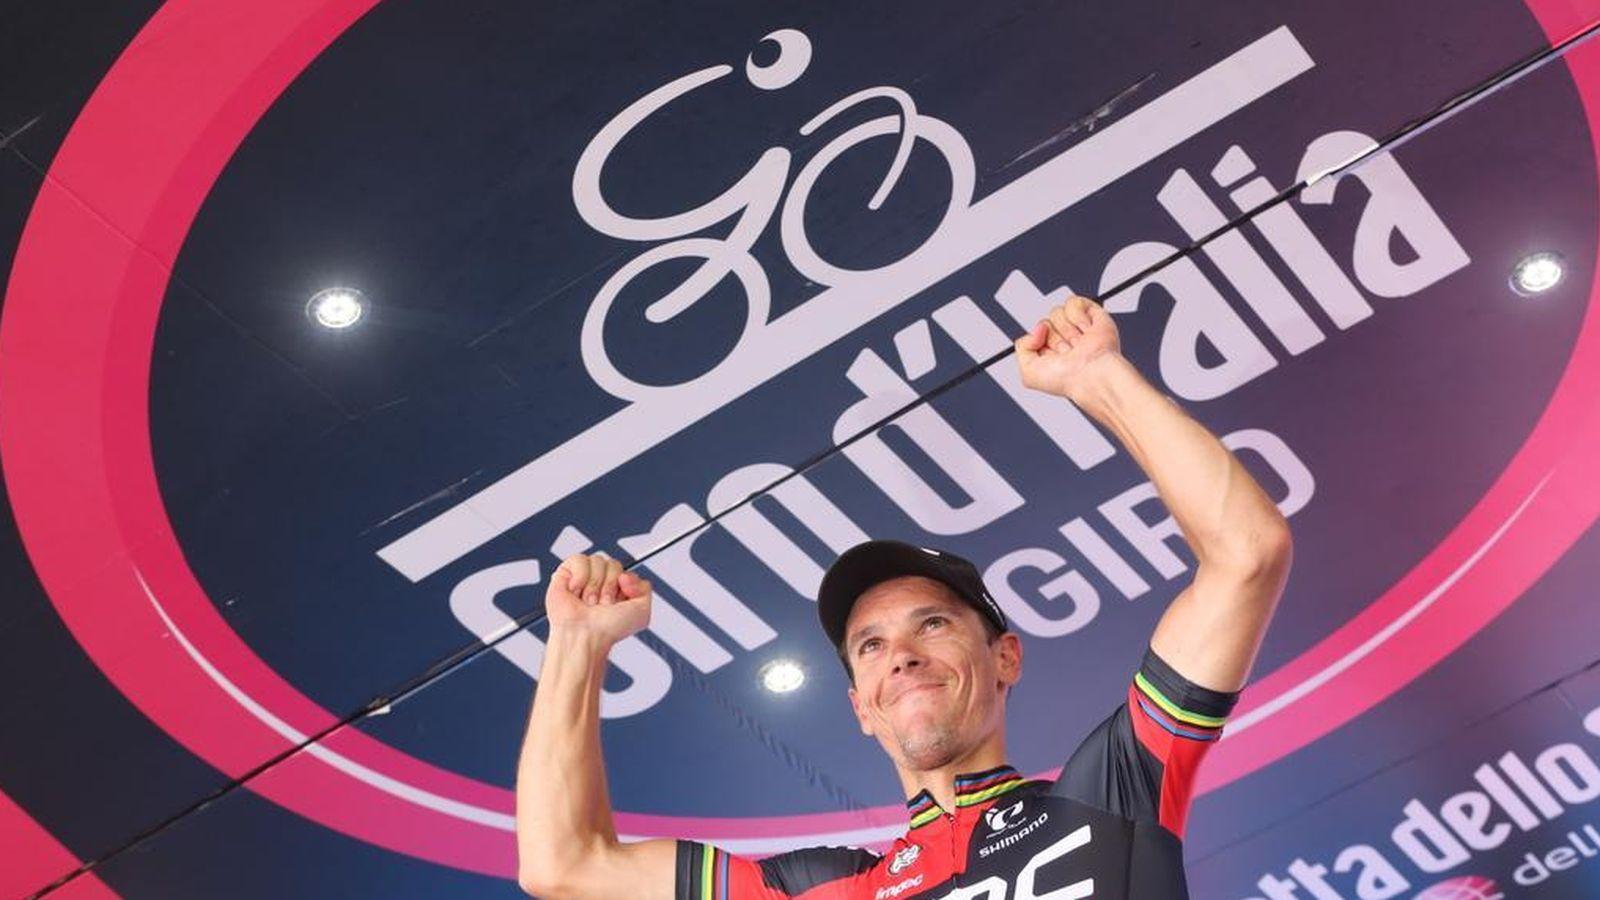 Foto: Gilbert ganó su segunda etapa (Foto: Giro)